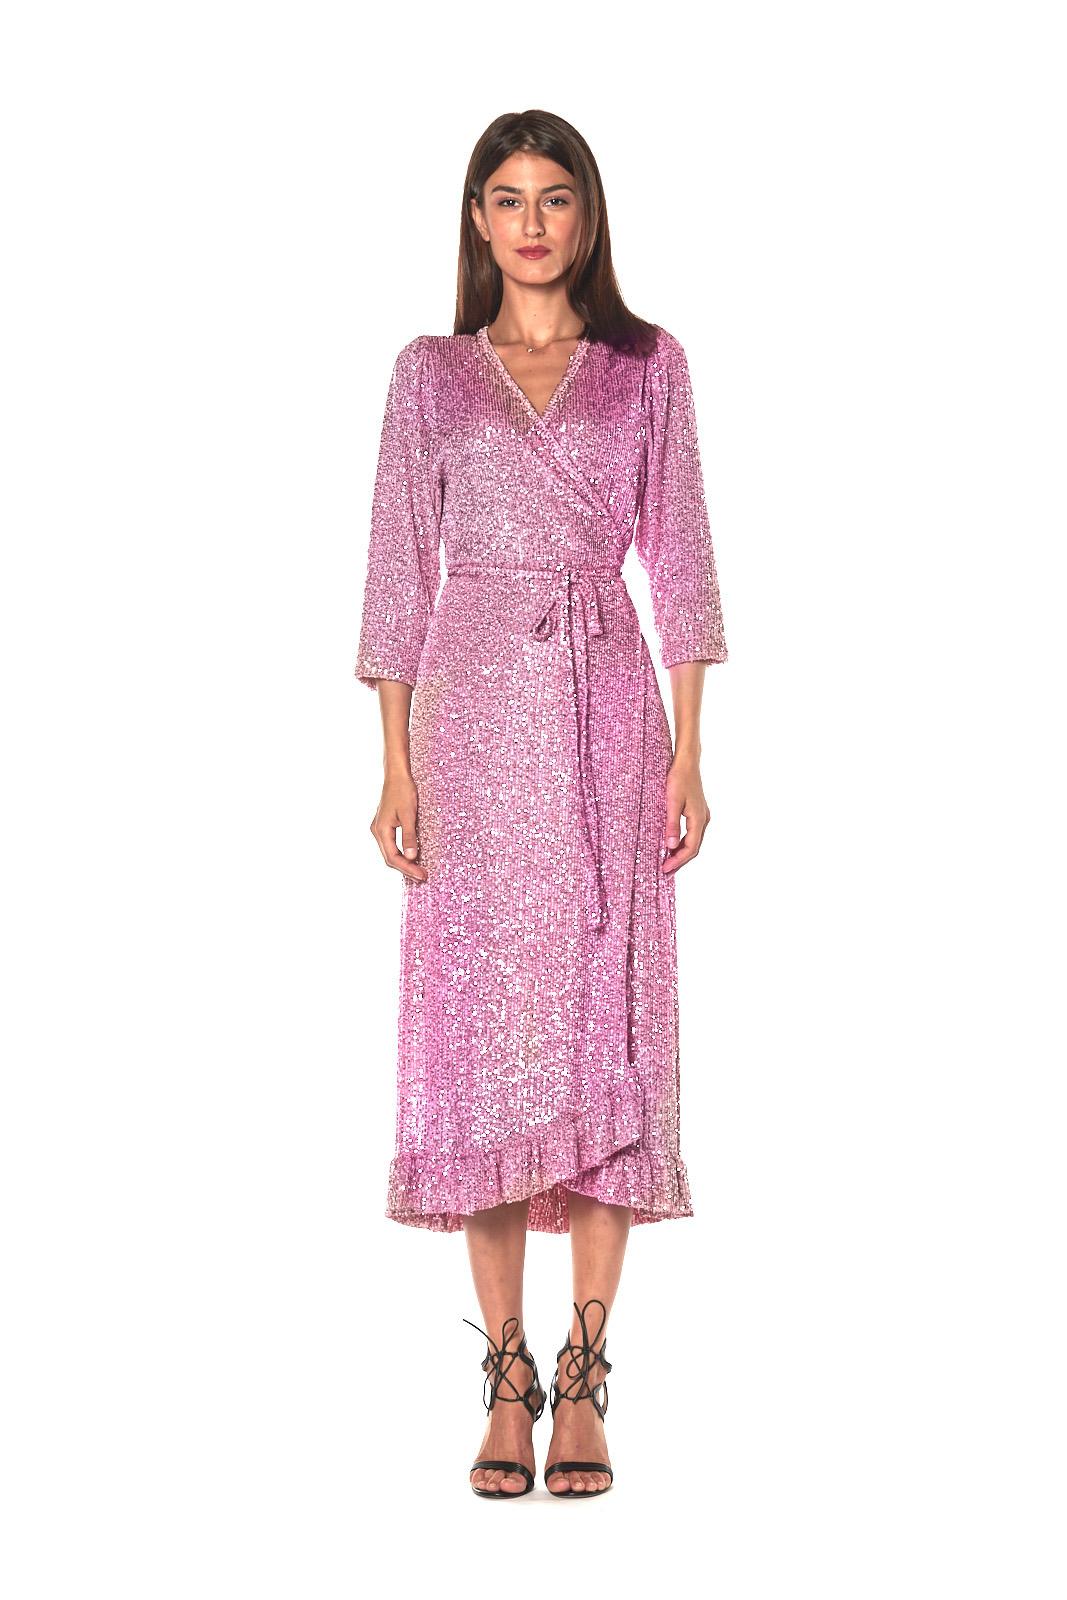 Barbara lilac sequined maxi evening dress